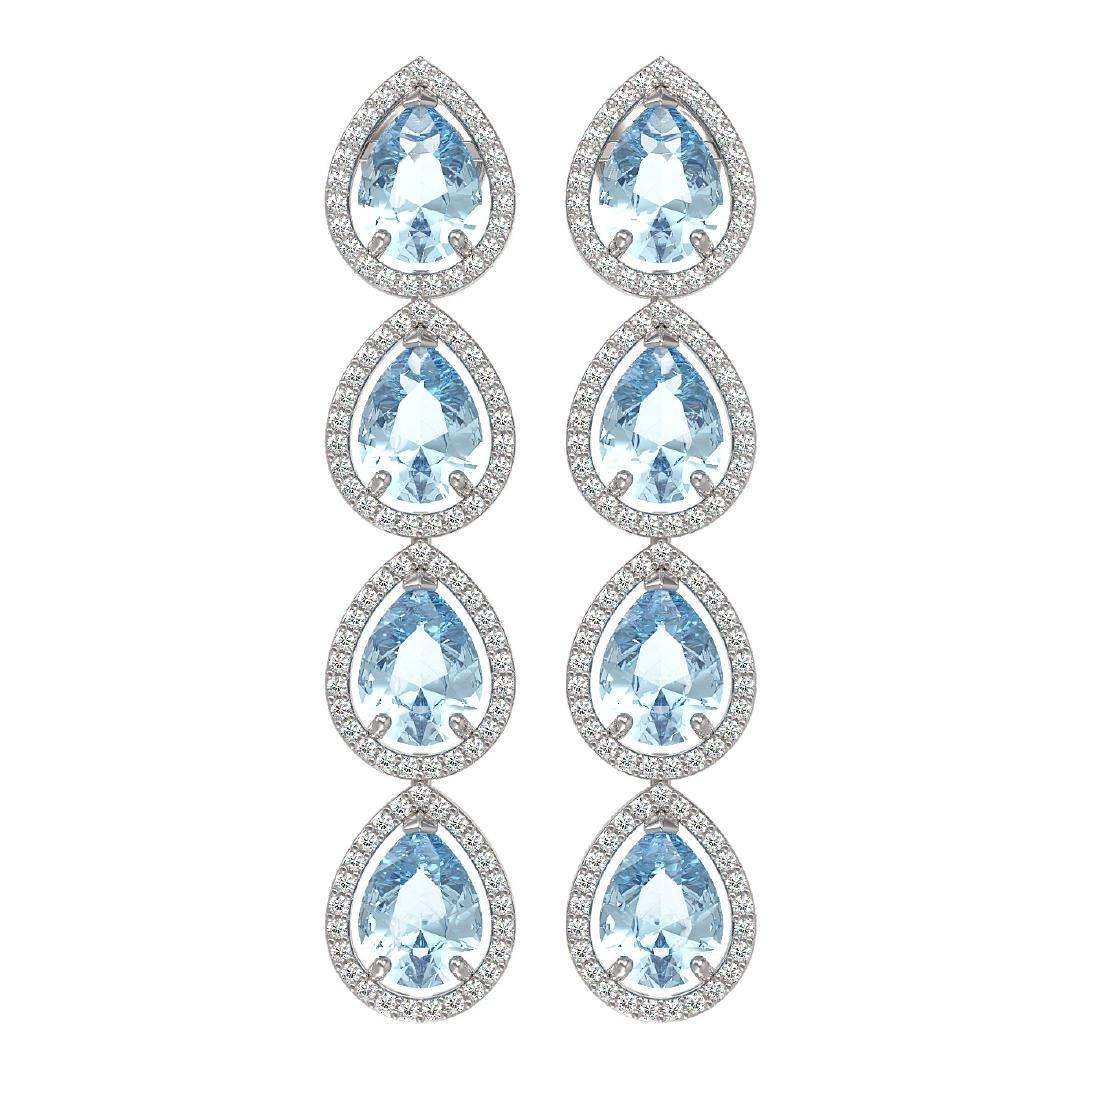 10.56 CTW Aquamarine & Diamond Halo Earrings 10K White